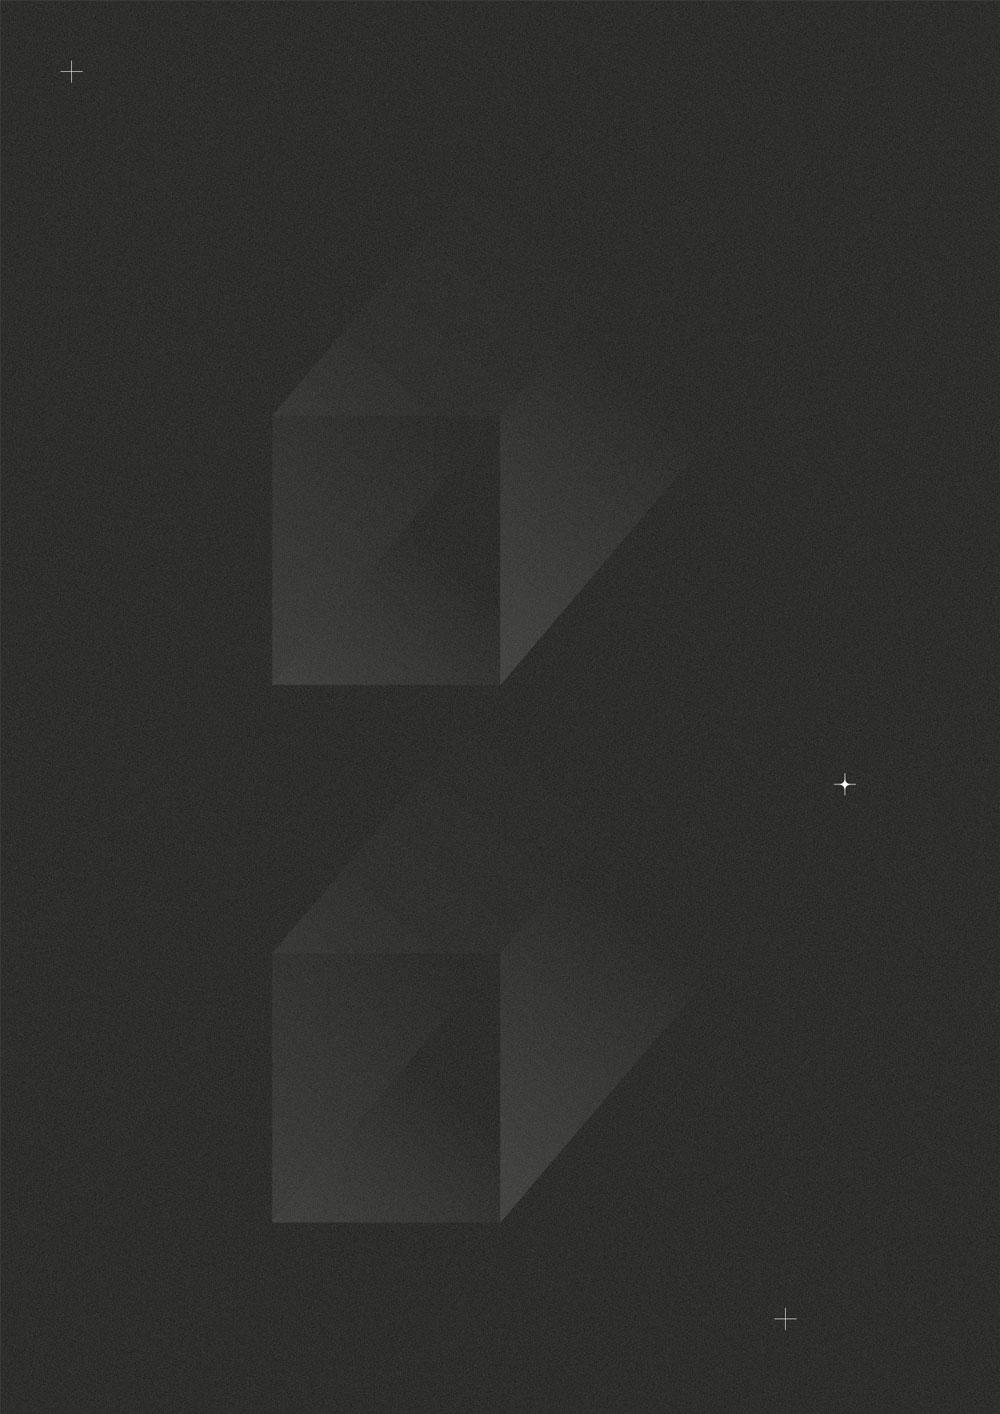 zr-space3